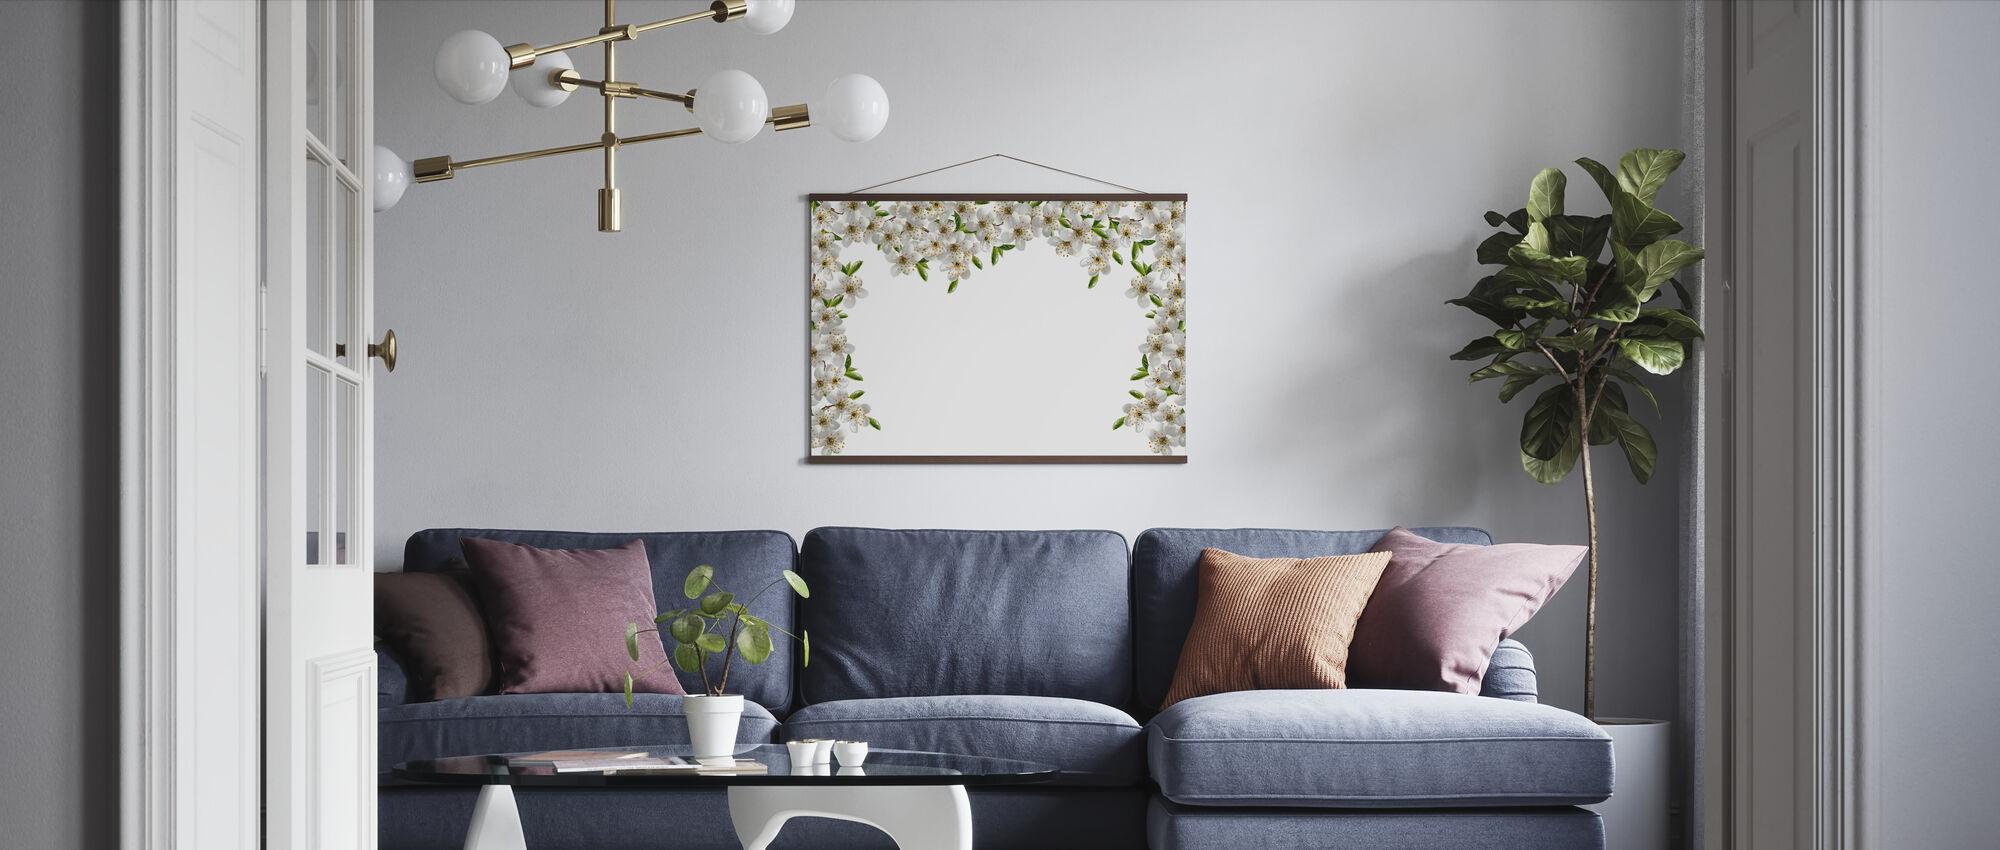 Kukkien runko - Juliste - Olohuone